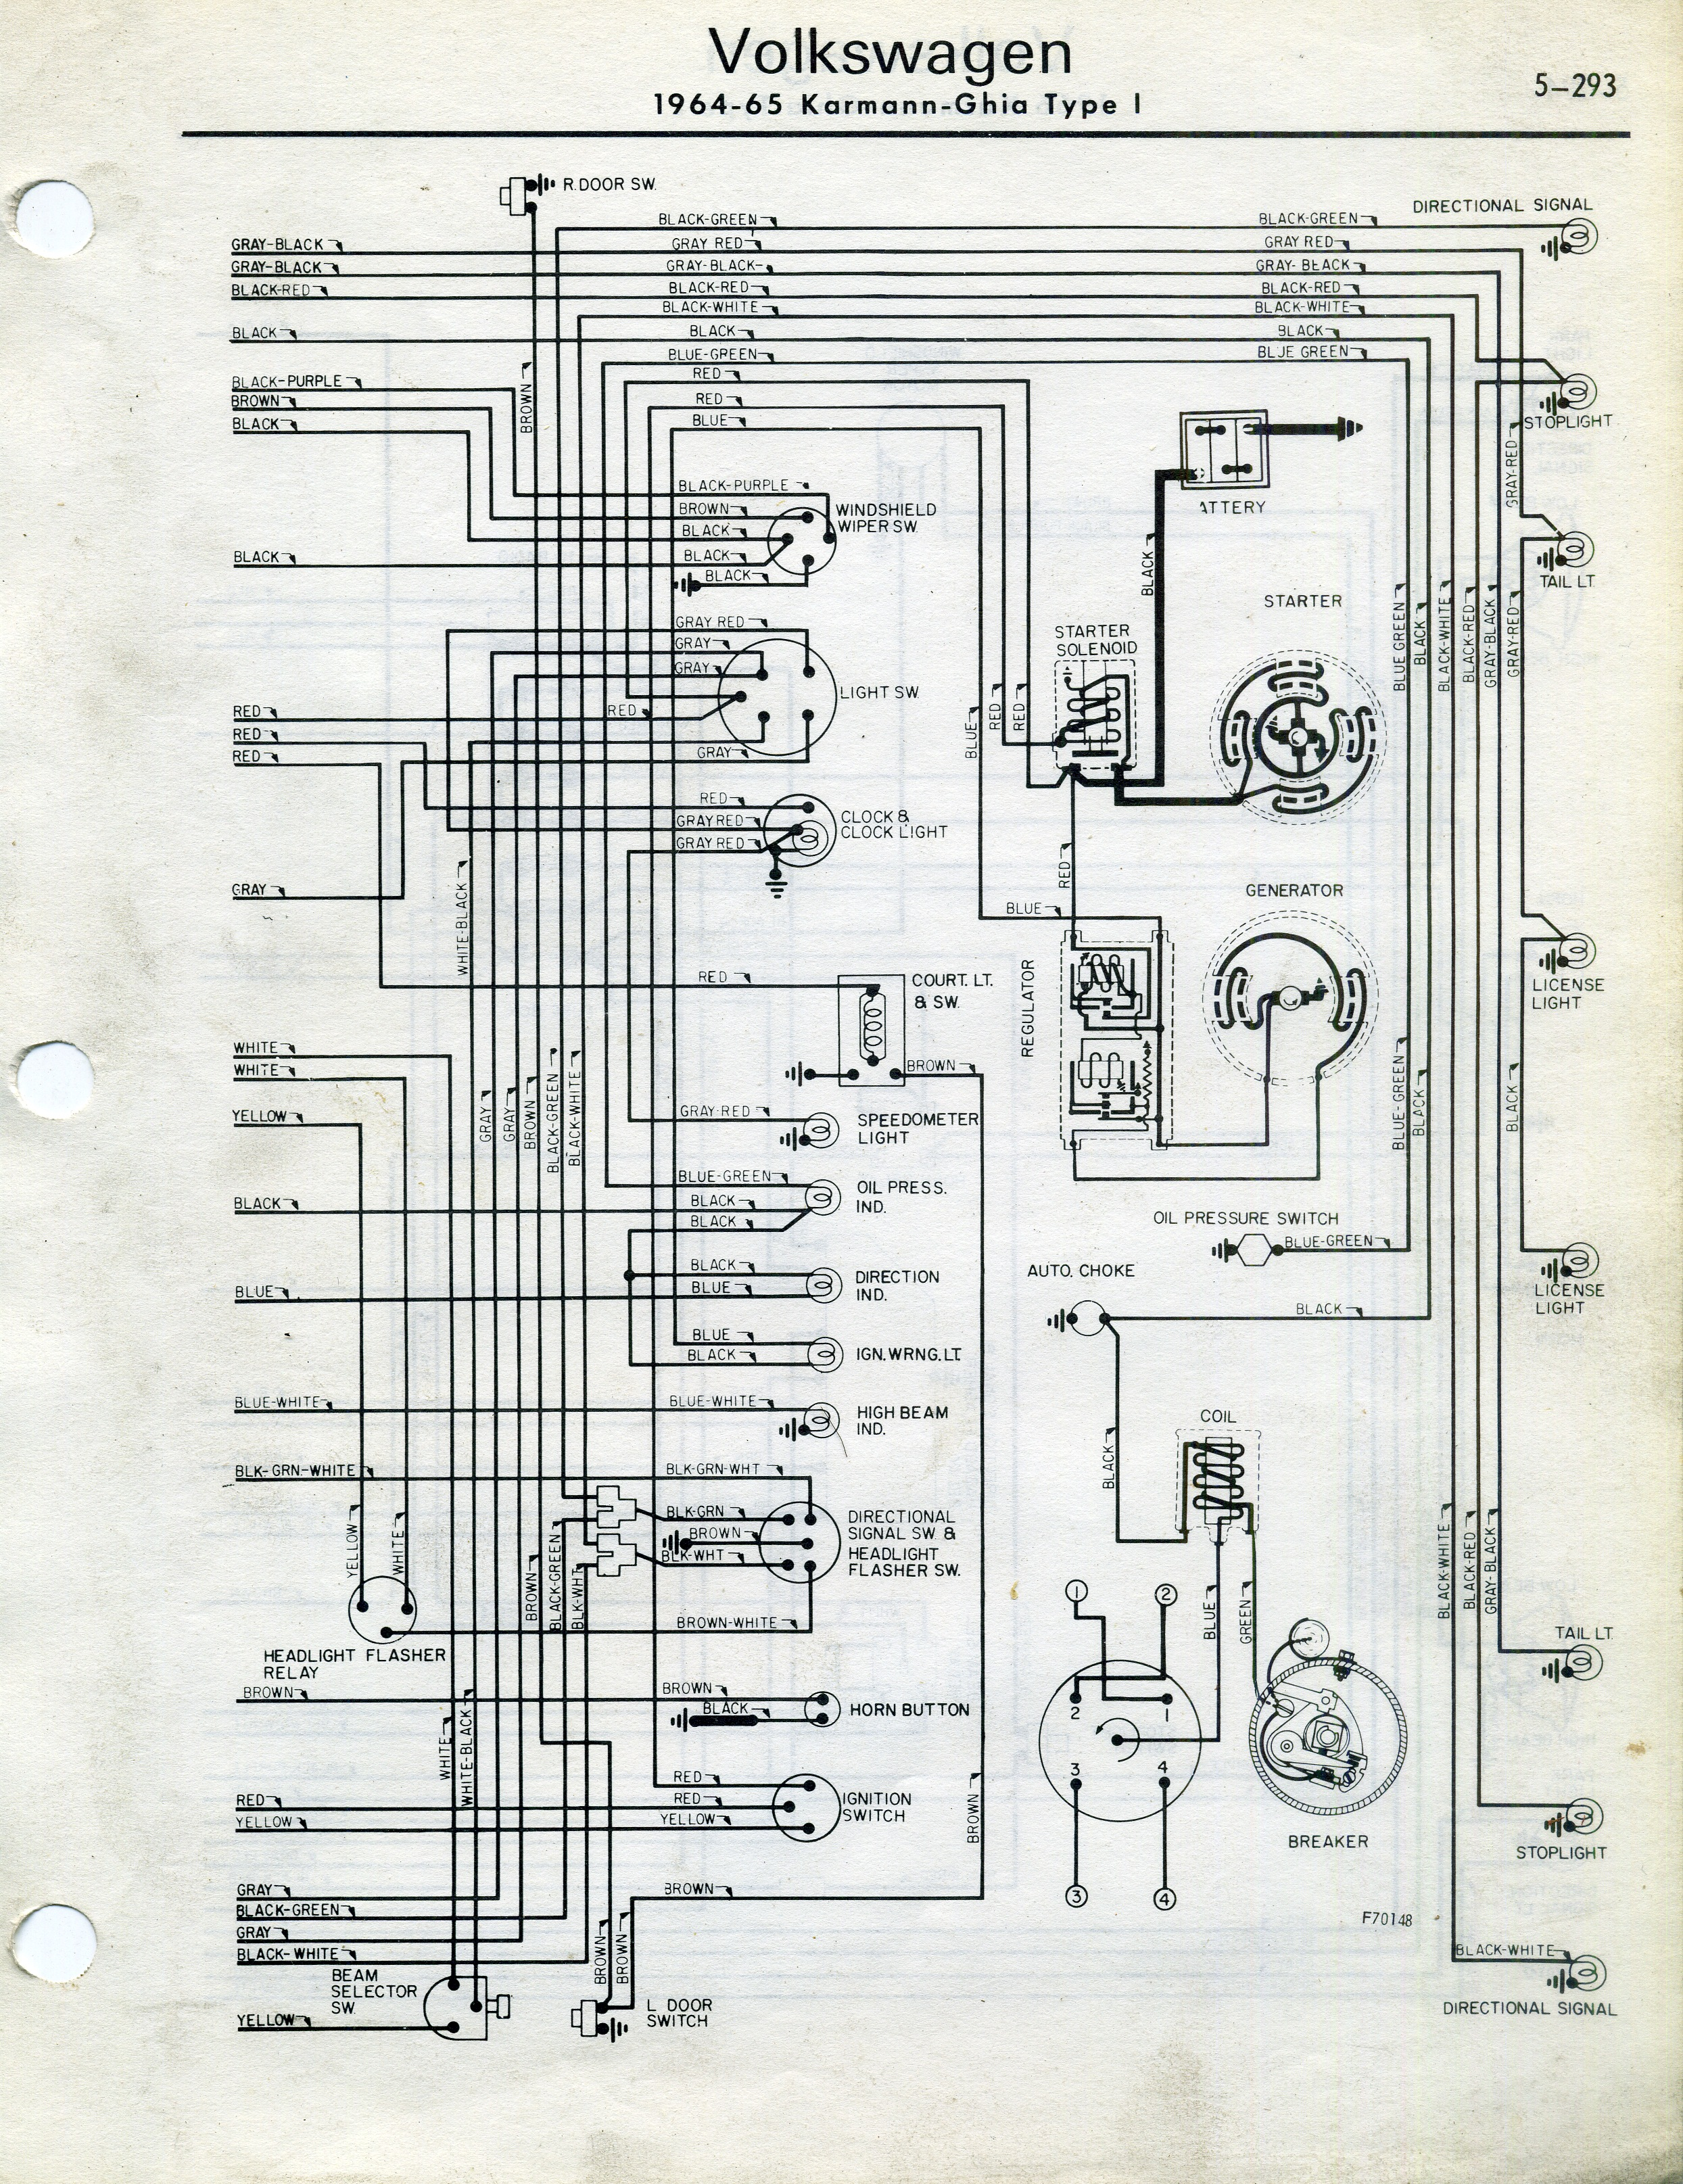 motor wiring diagrams beckett burner diagram thesamba.com :: karmann ghia